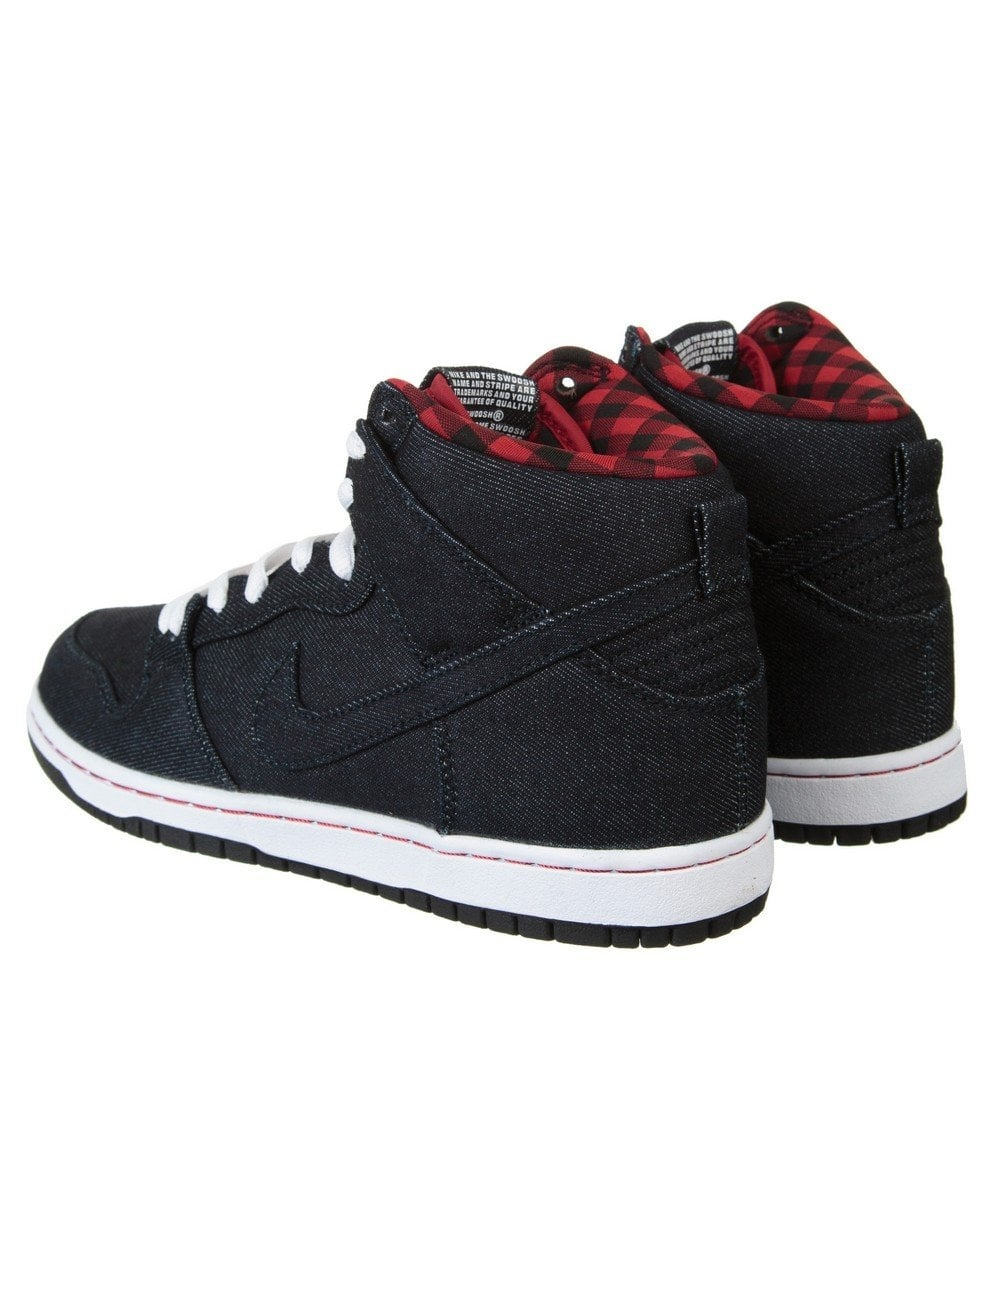 watch 90a49 8c907 Dunk High Premium Boots - Dark Obsidian Sale